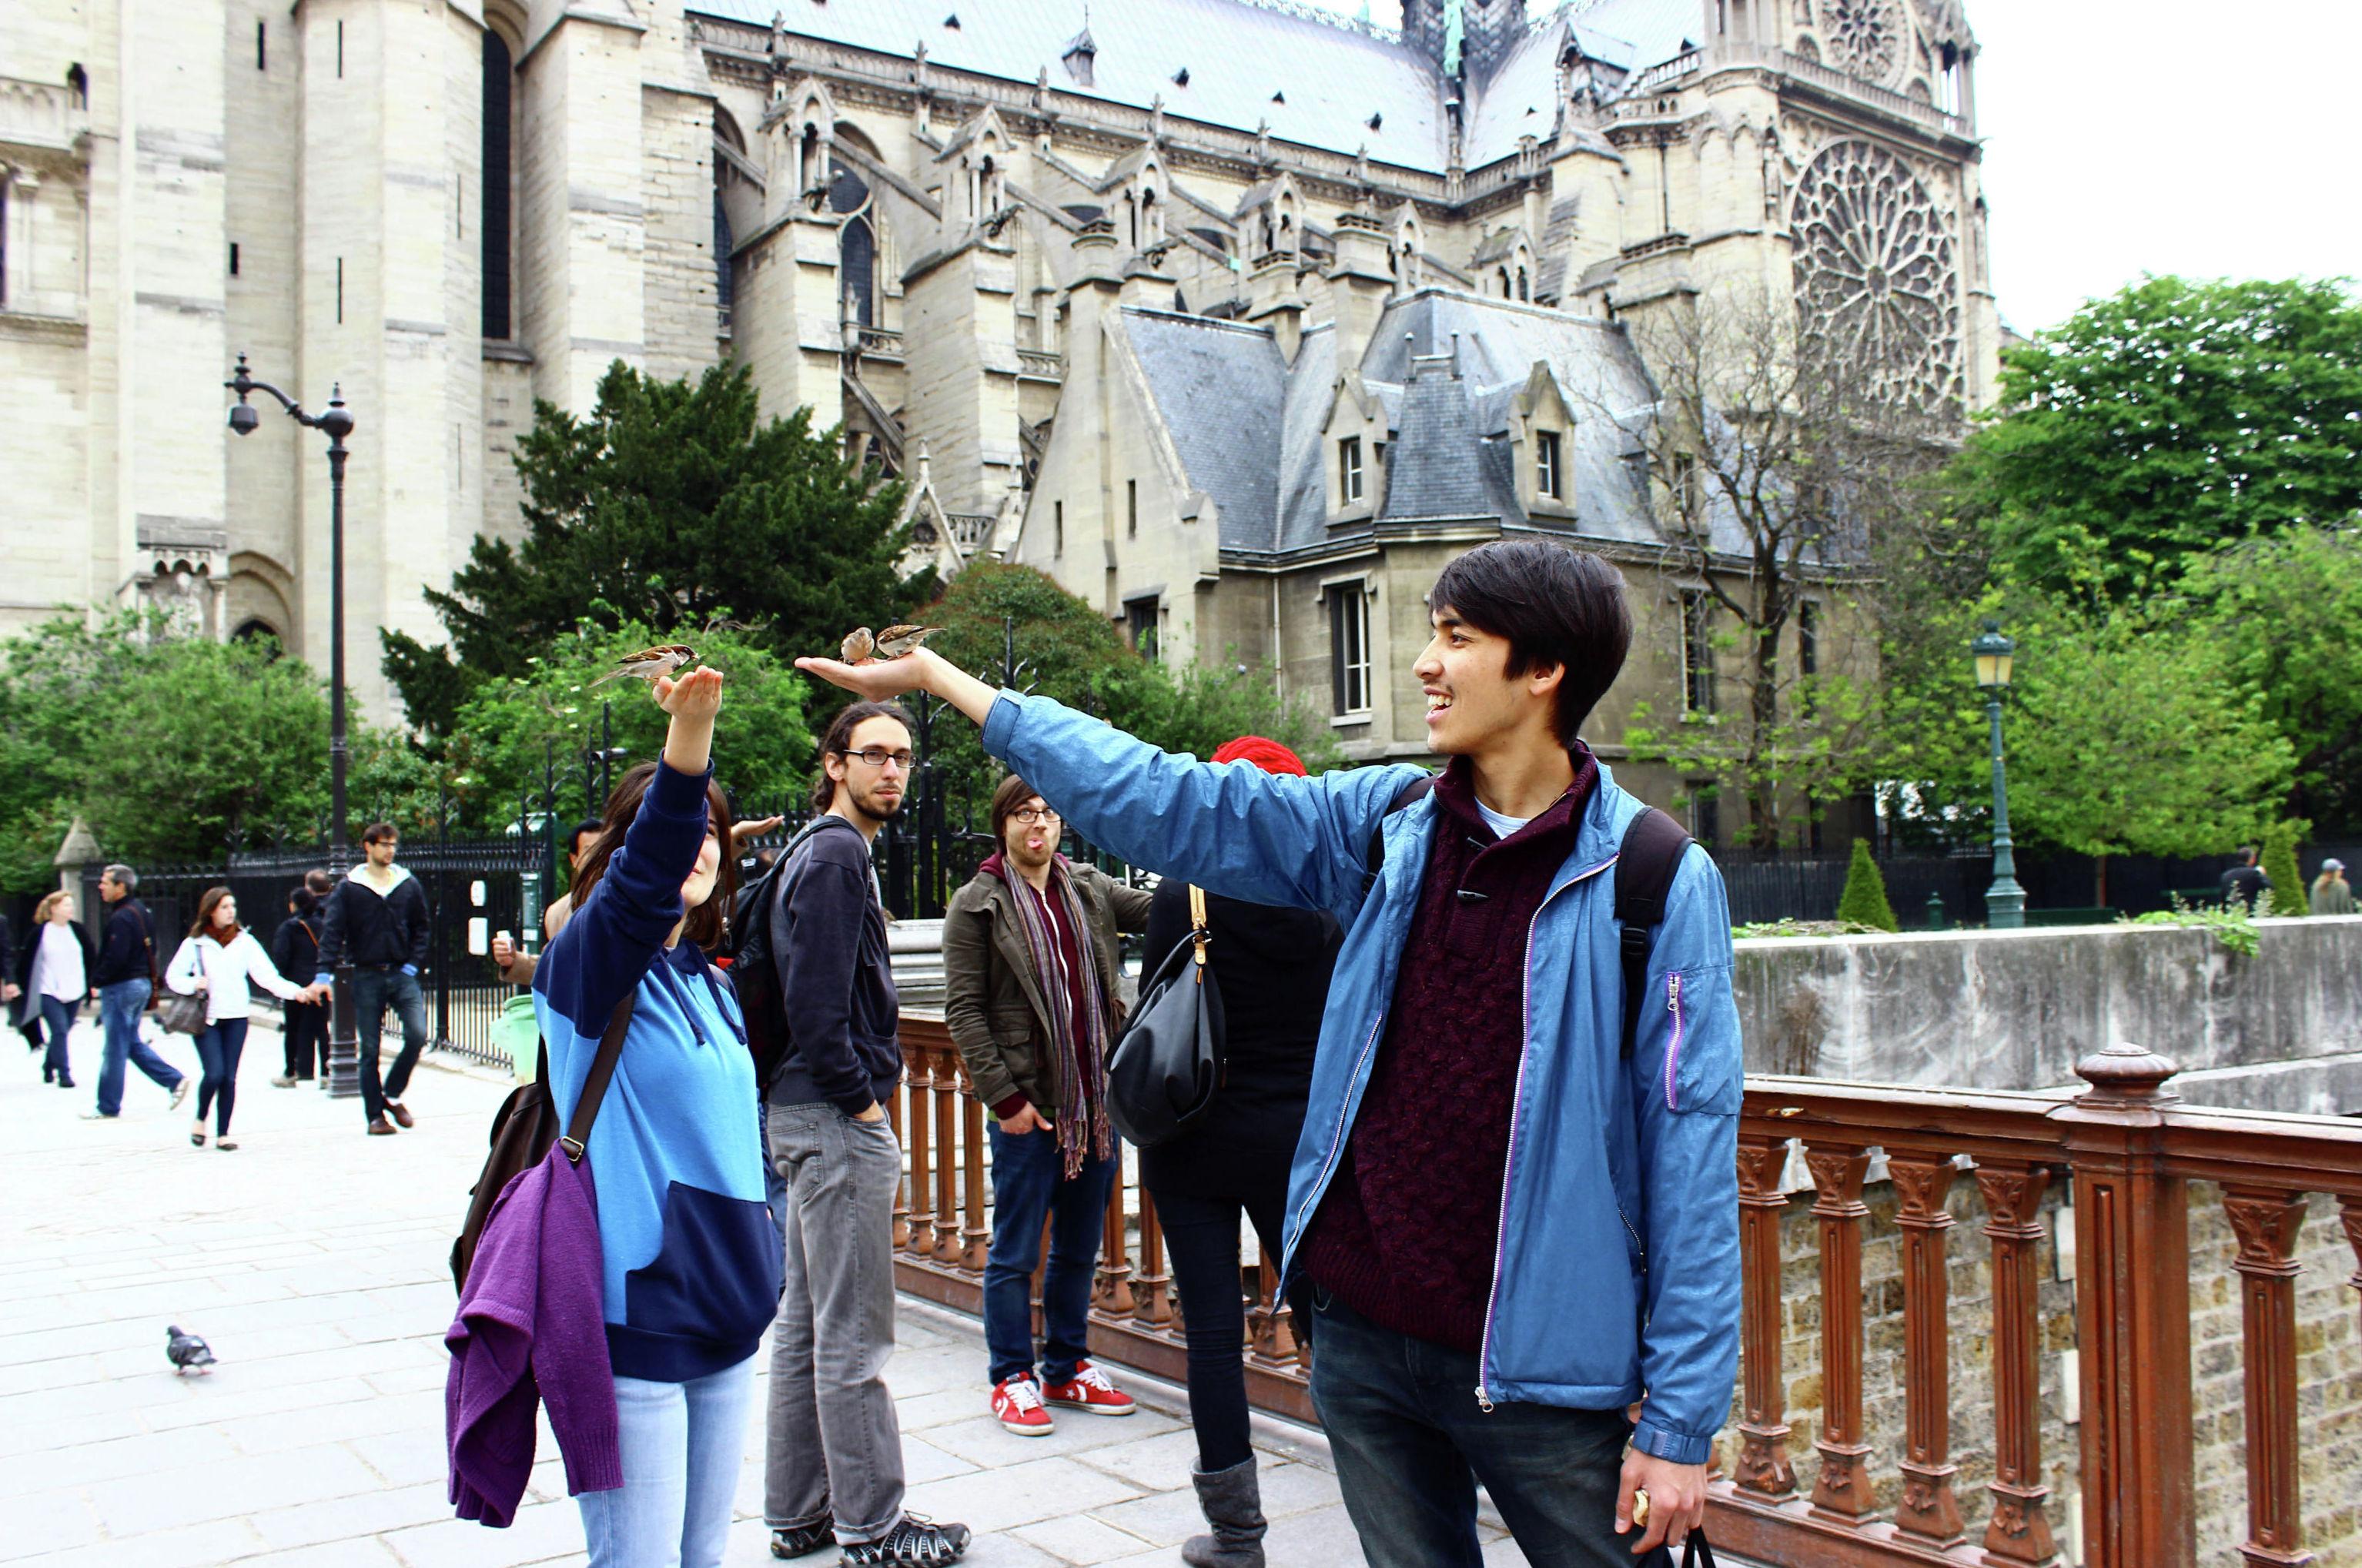 Кыргызстанец Бауржан Токтабеков во время путешествия по Европе